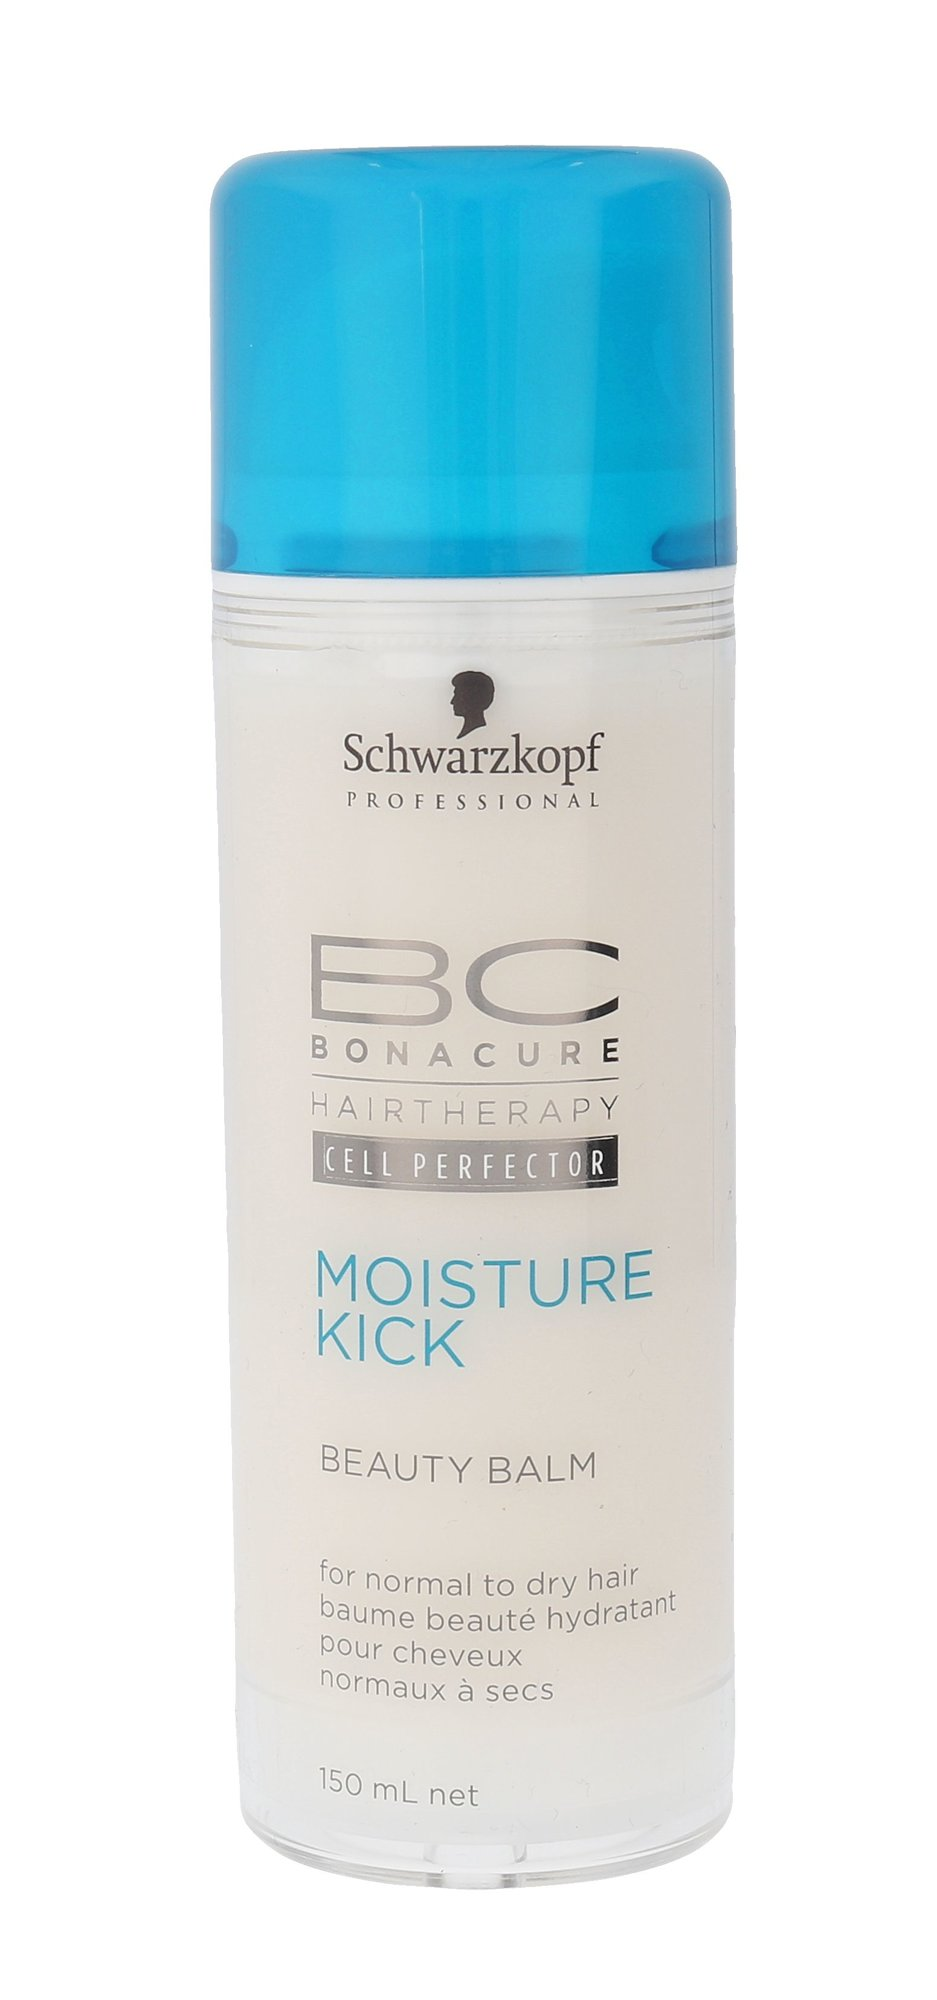 Schwarzkopf BC Bonacure Moisture Kick Cosmetic 150ml